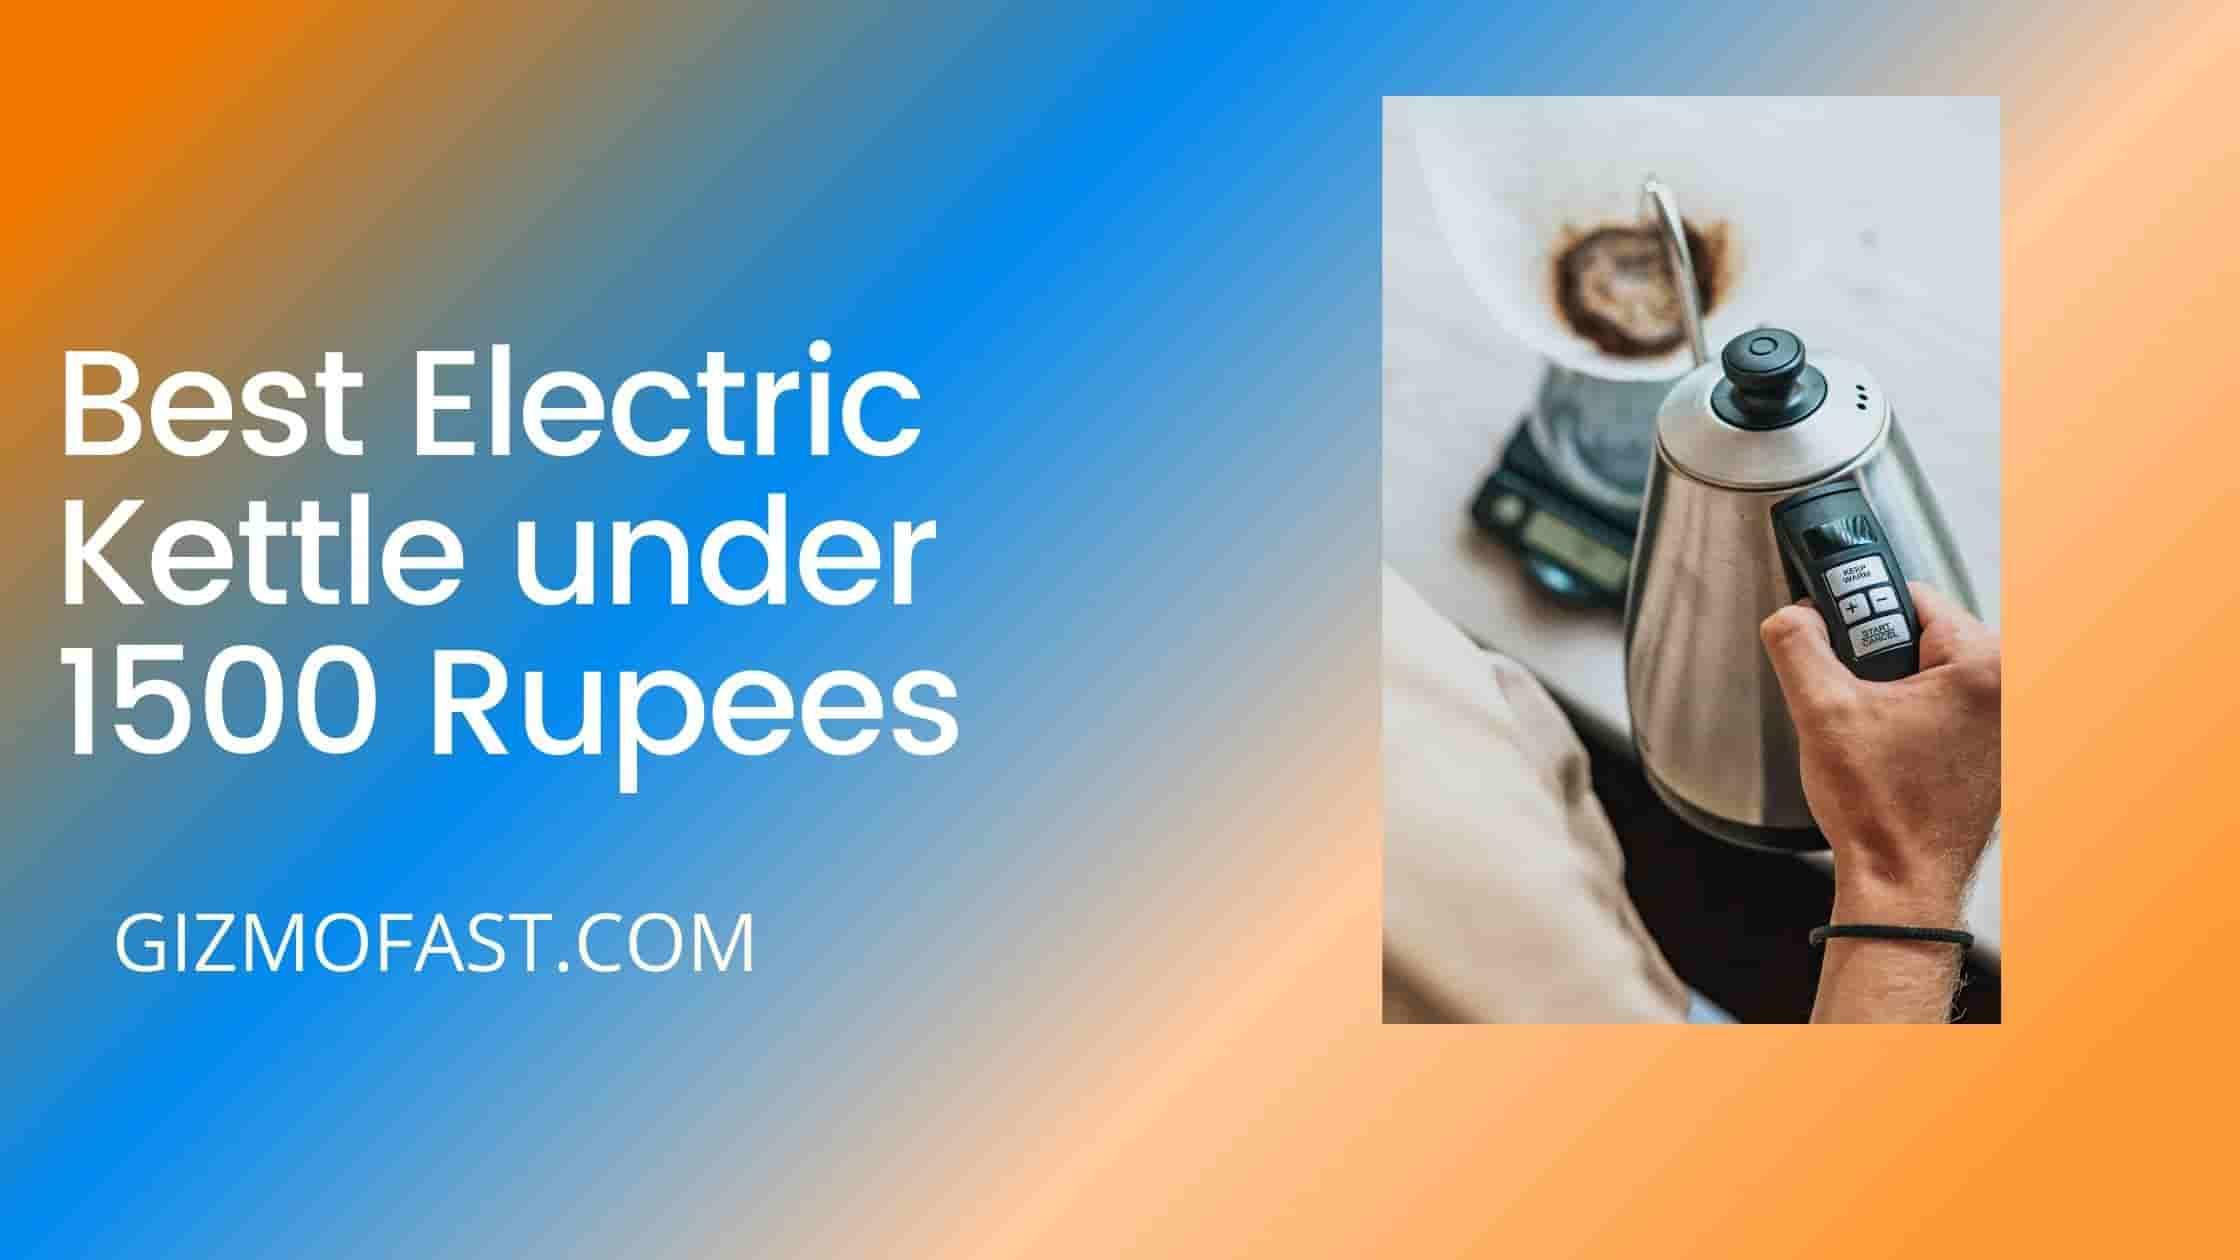 Best Electric Kettle under 1500